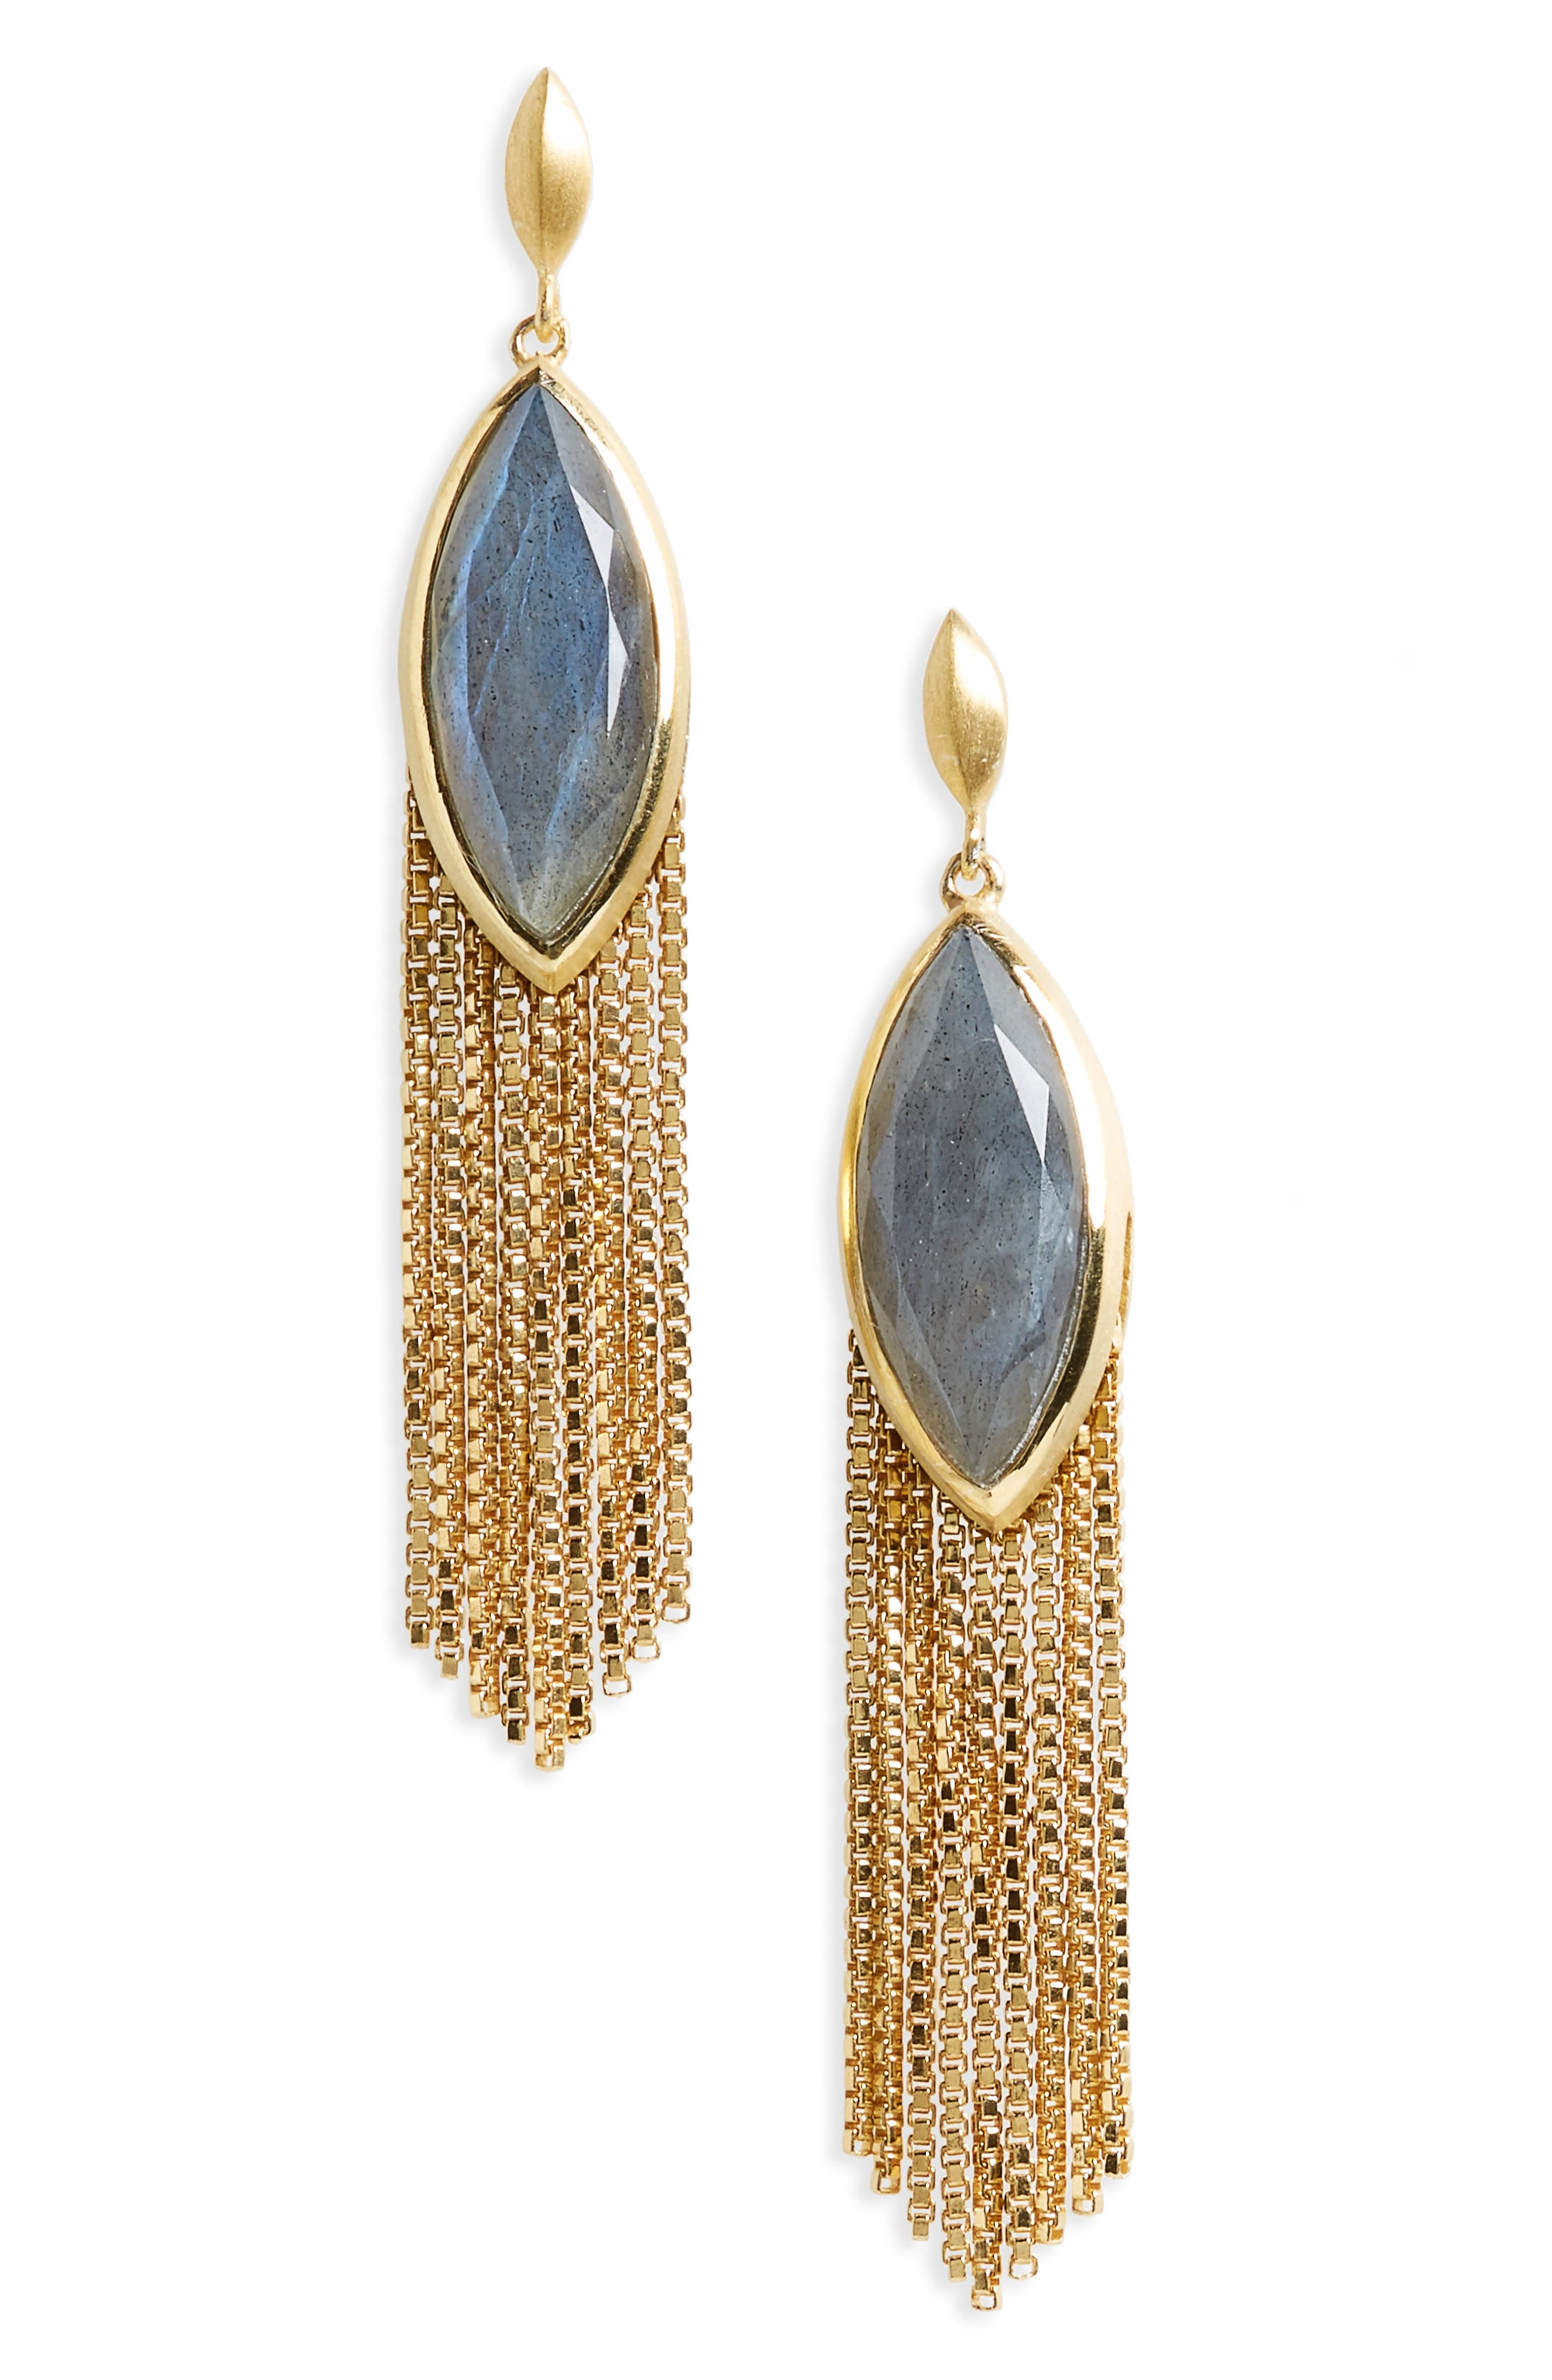 Ornate Semiprecious Stone Fringe Earrings,                         Main,                         color, 020